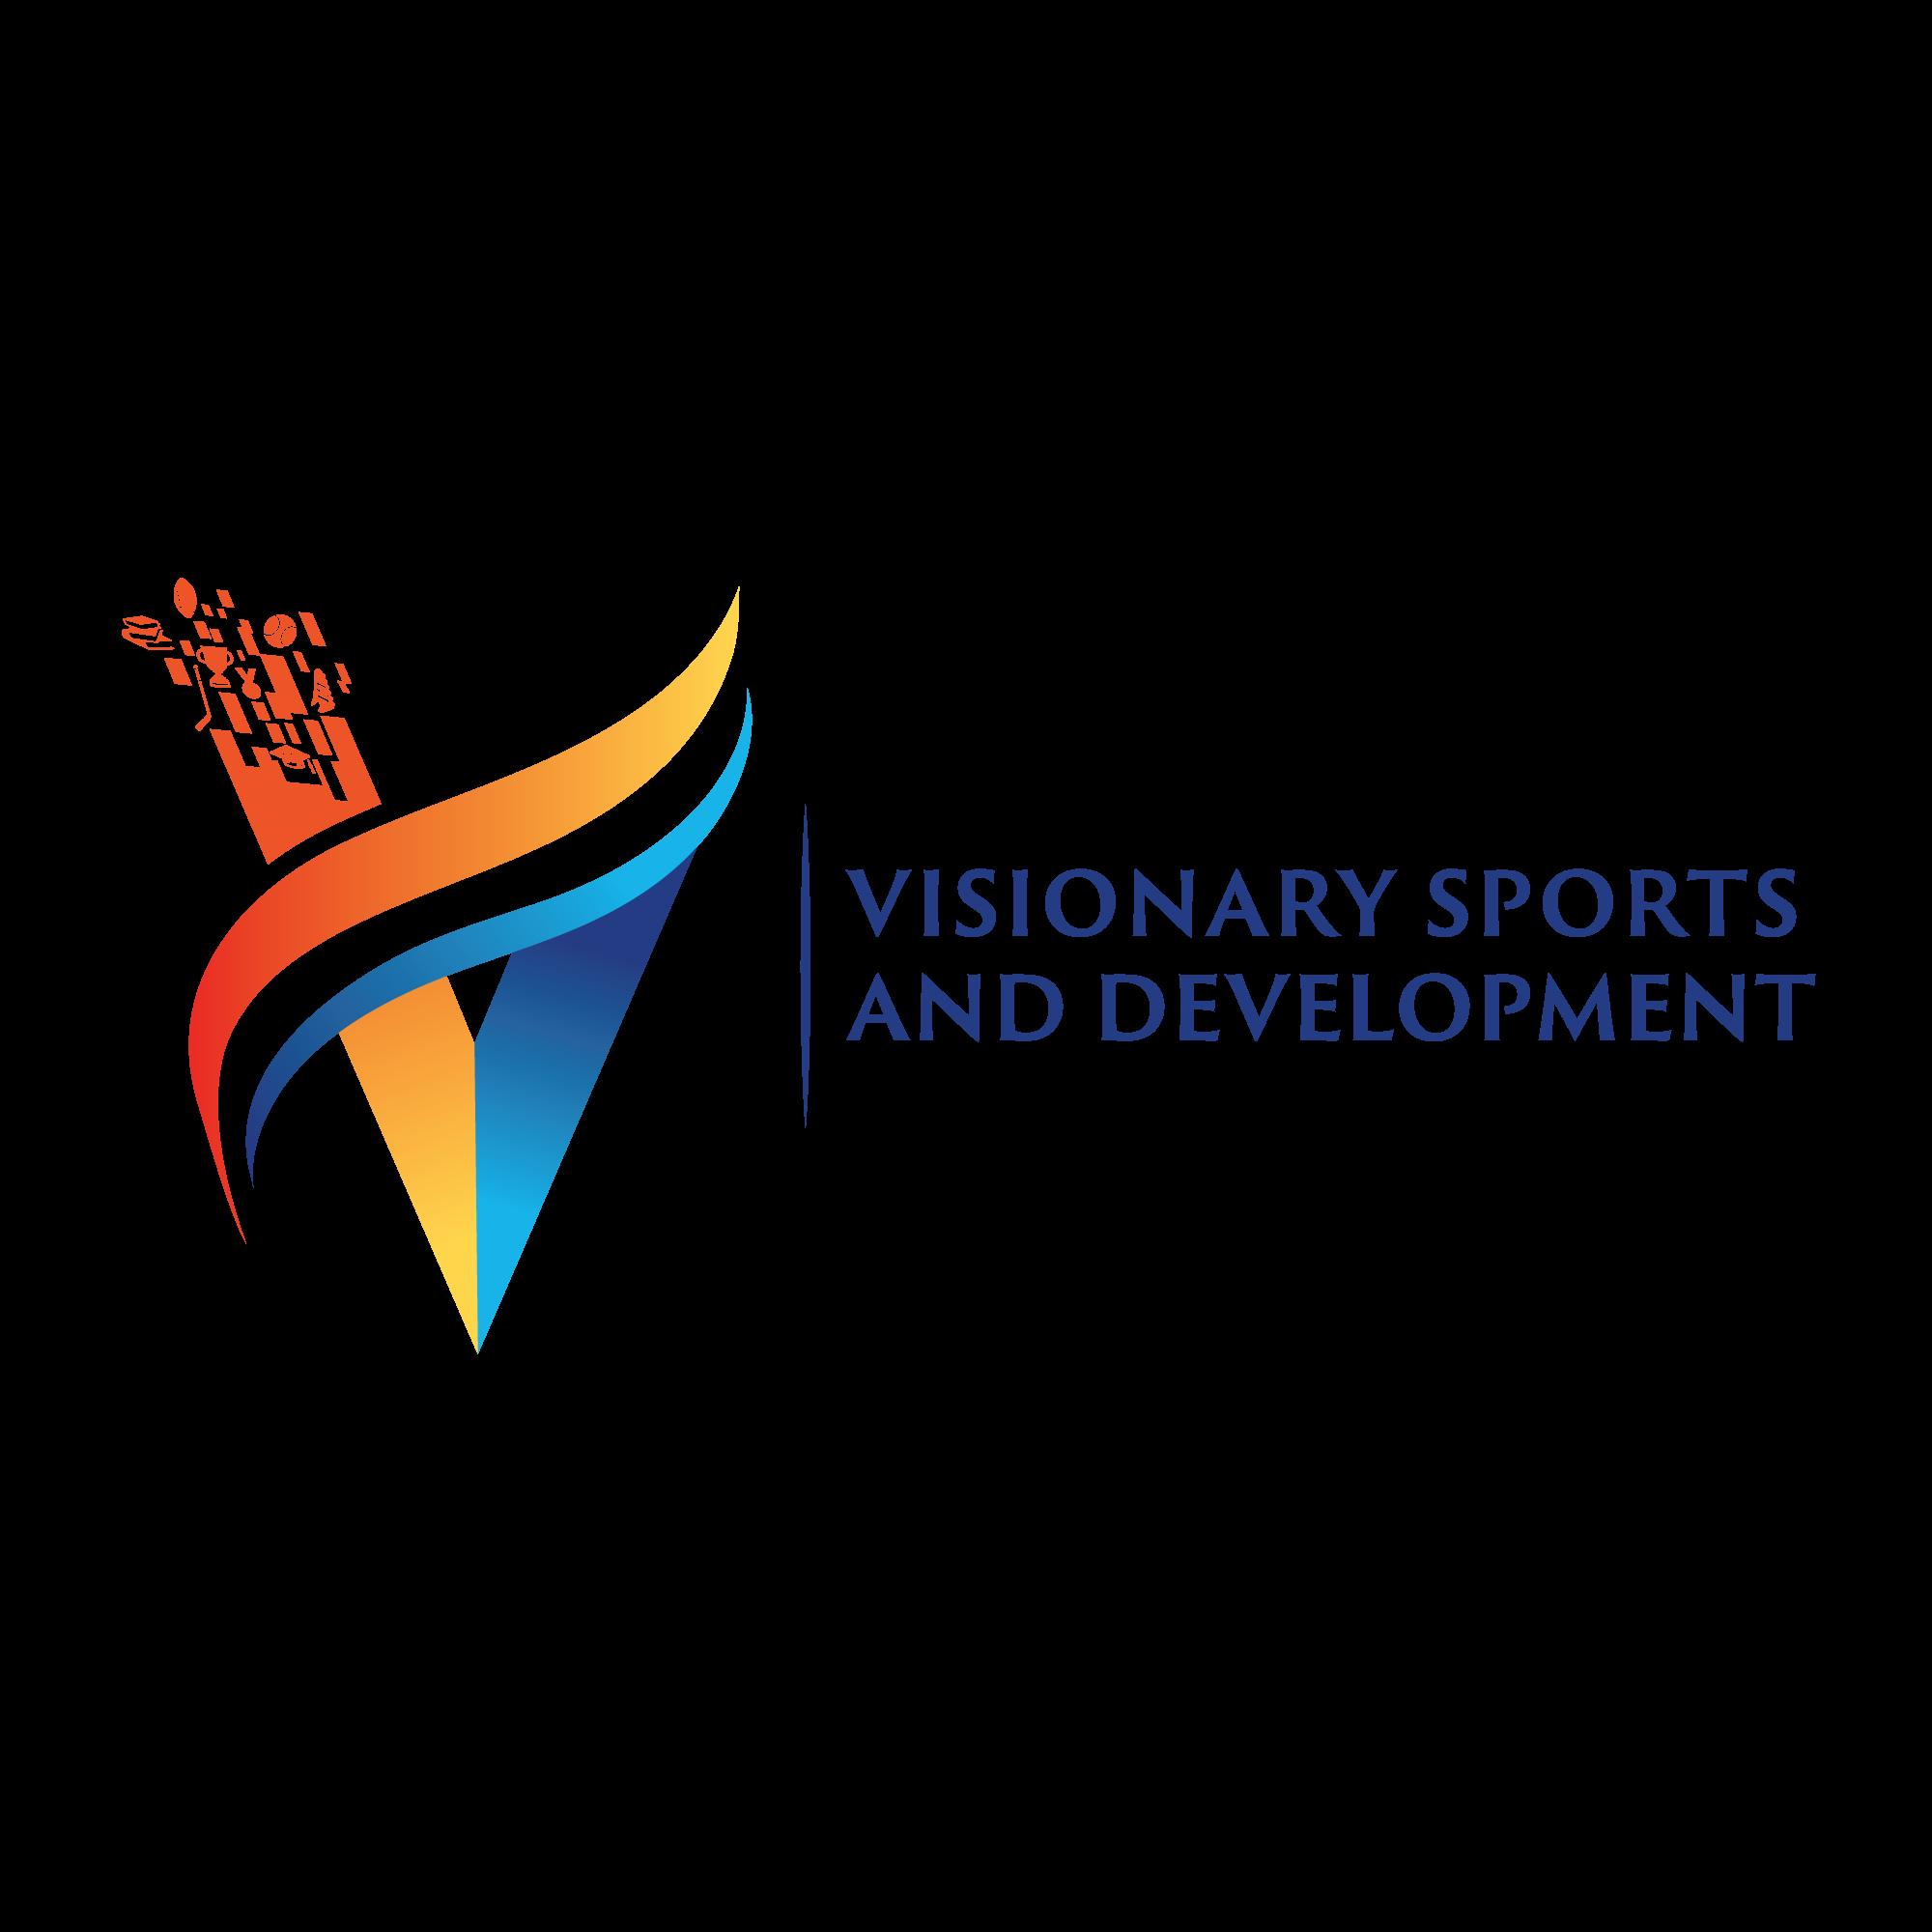 Visionary Sports